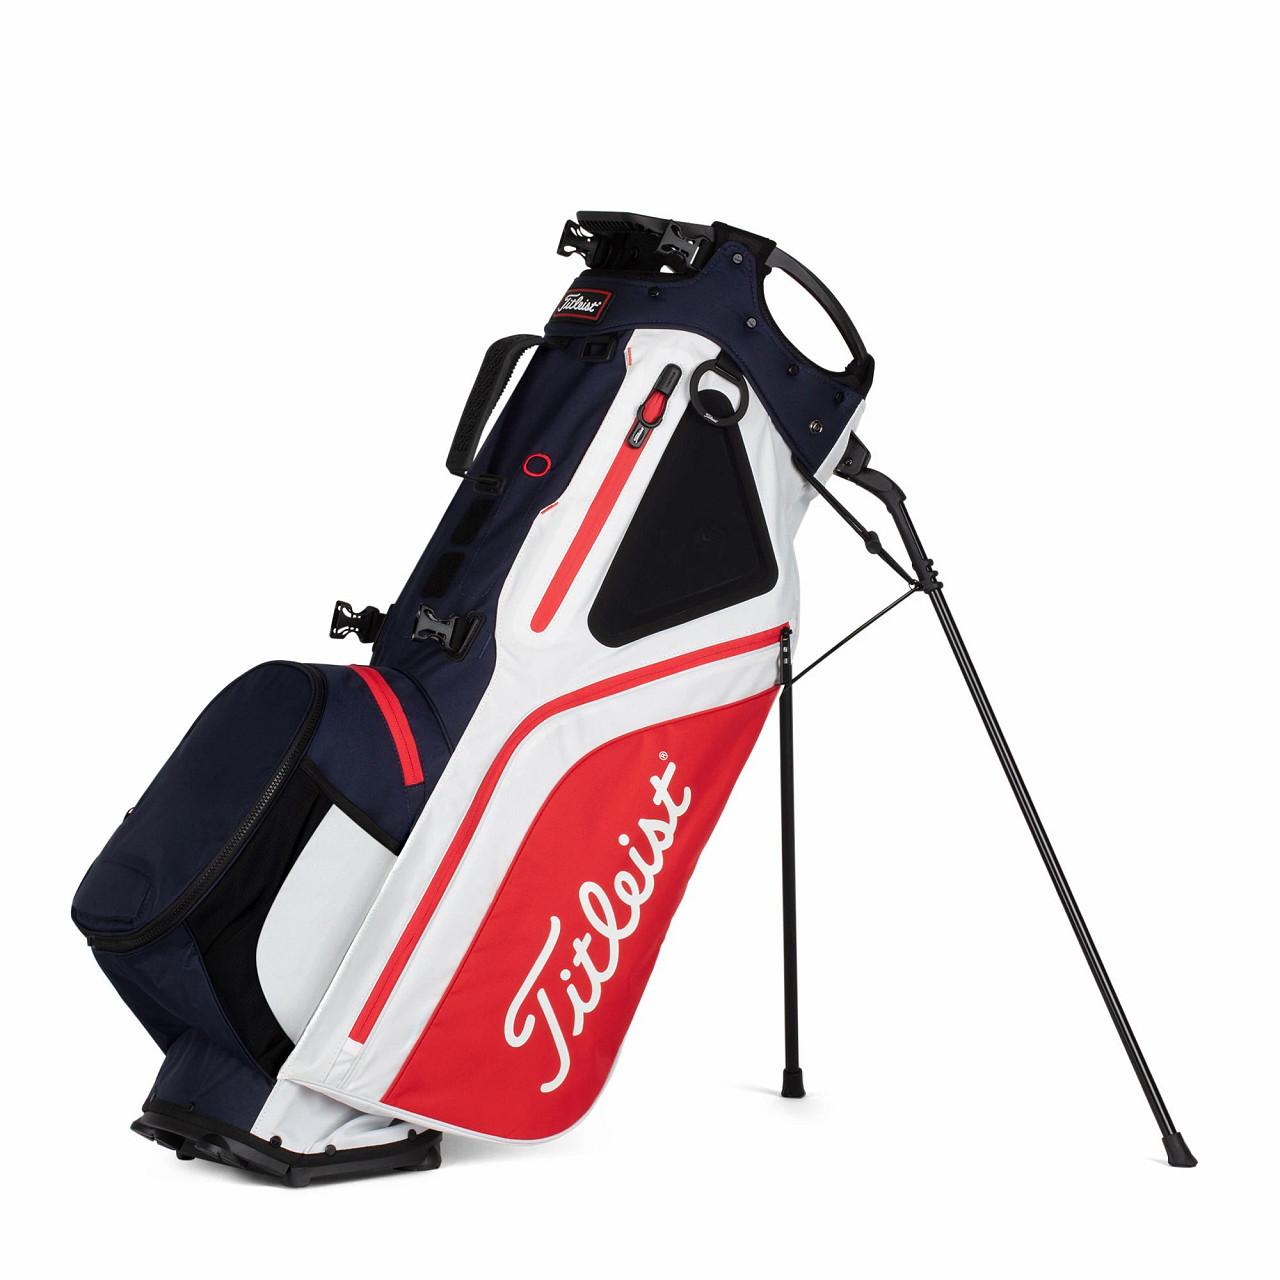 Titleist Hybrid 5 Golf Bag 2021 - Navy / White / Red